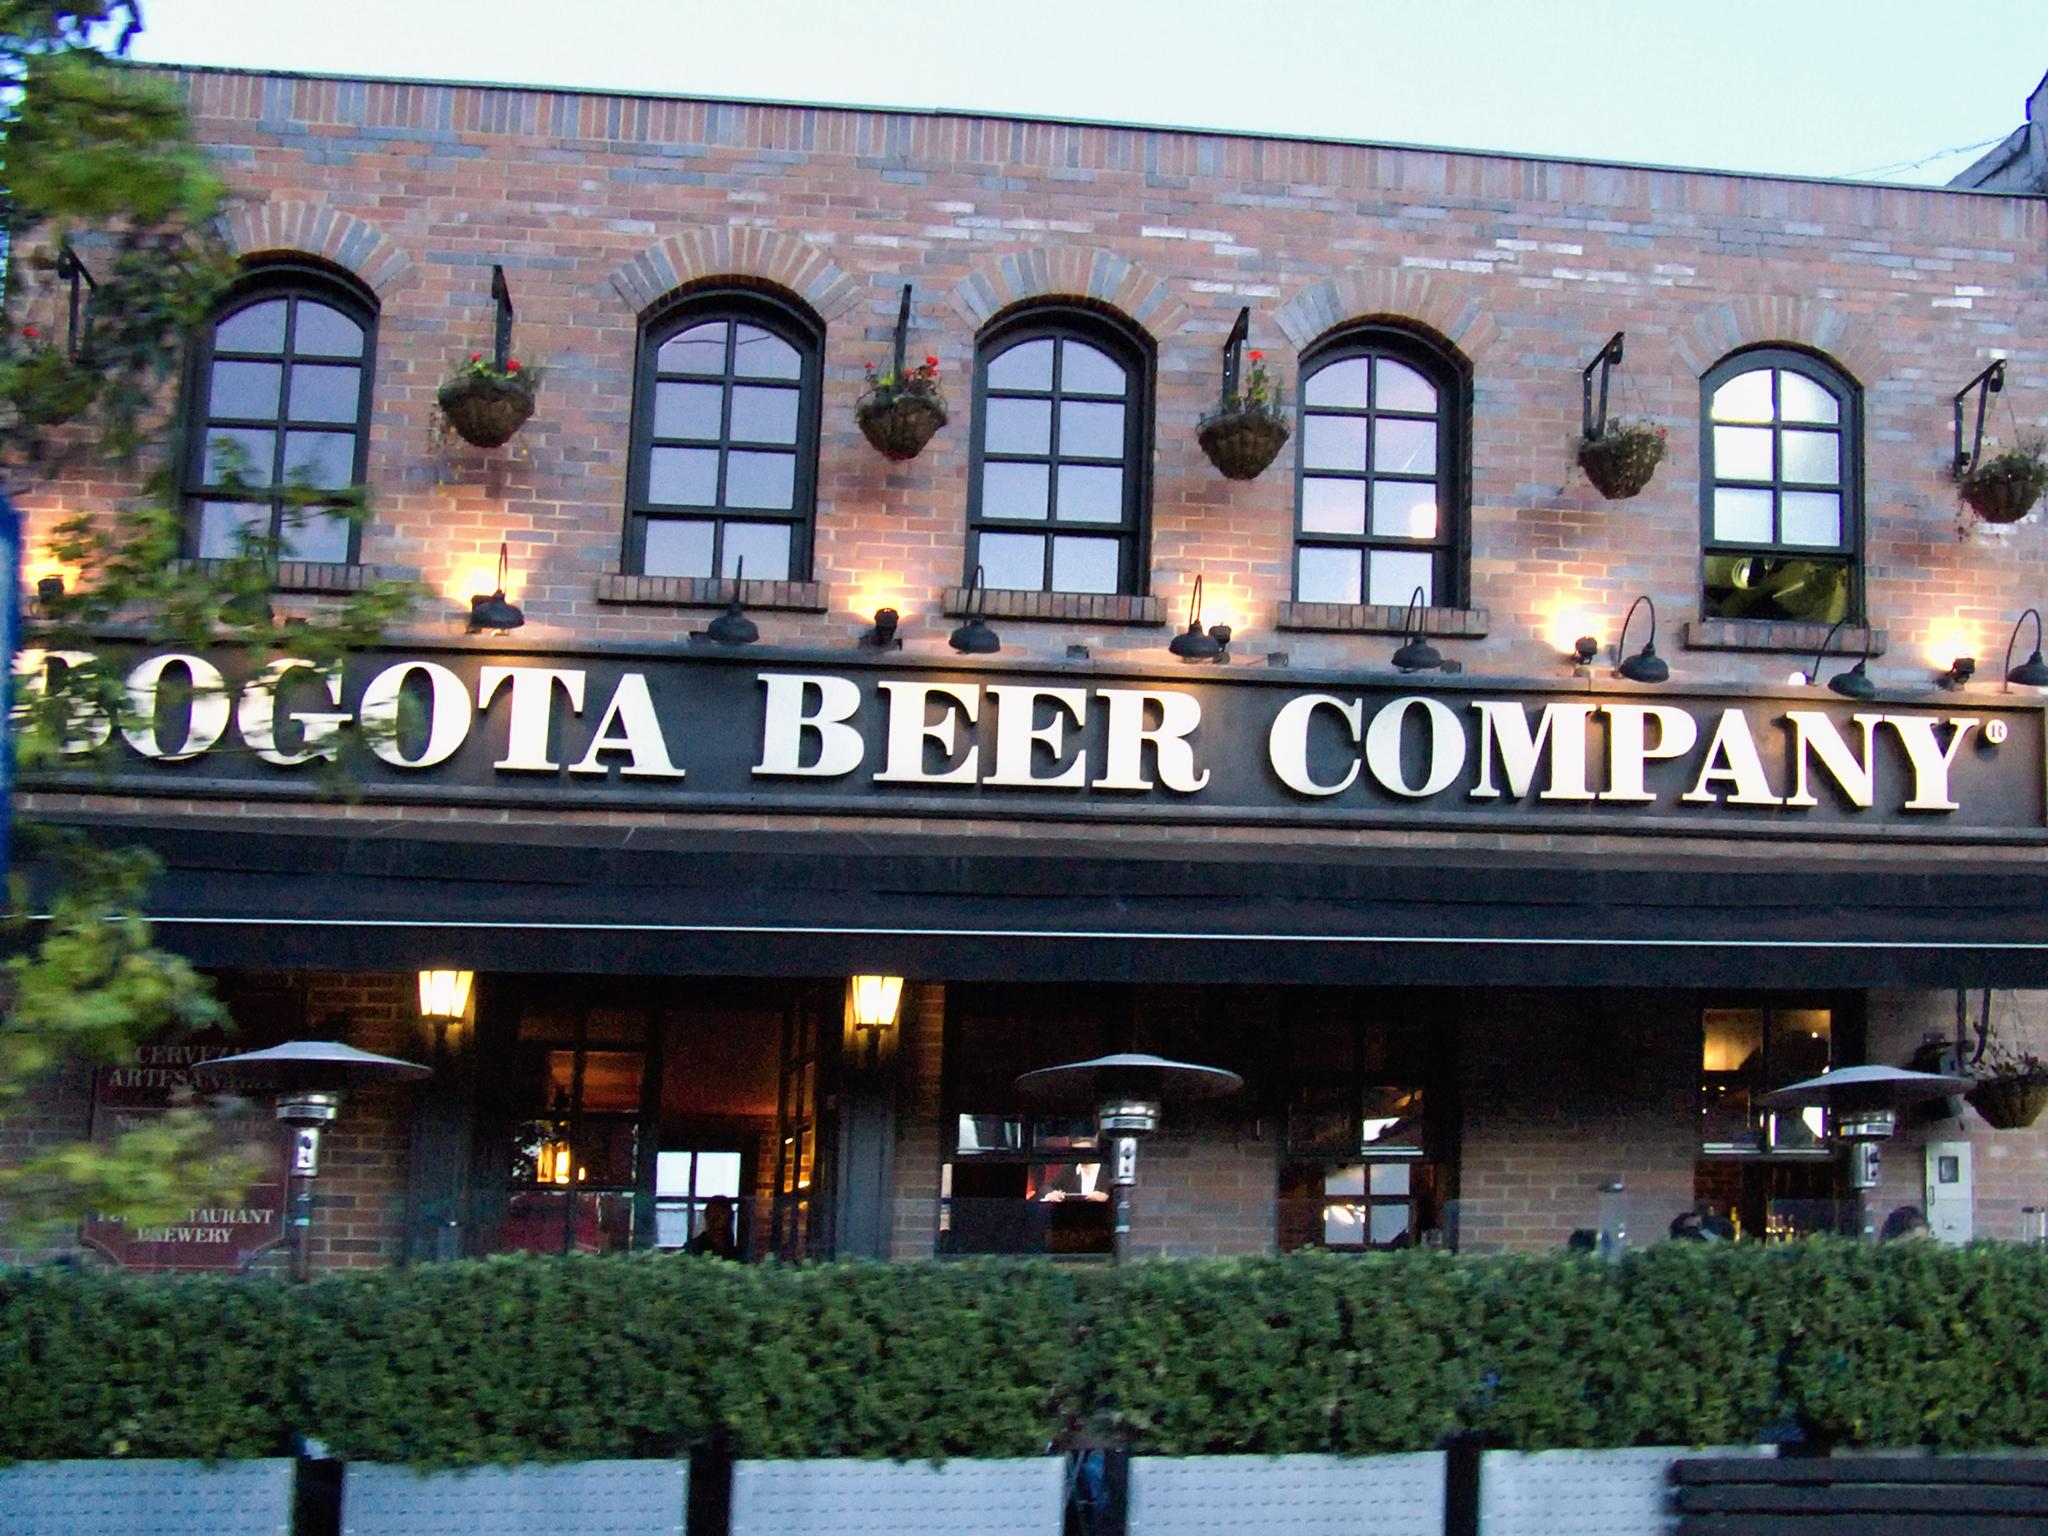 Bogota_Beer_Company.jpg